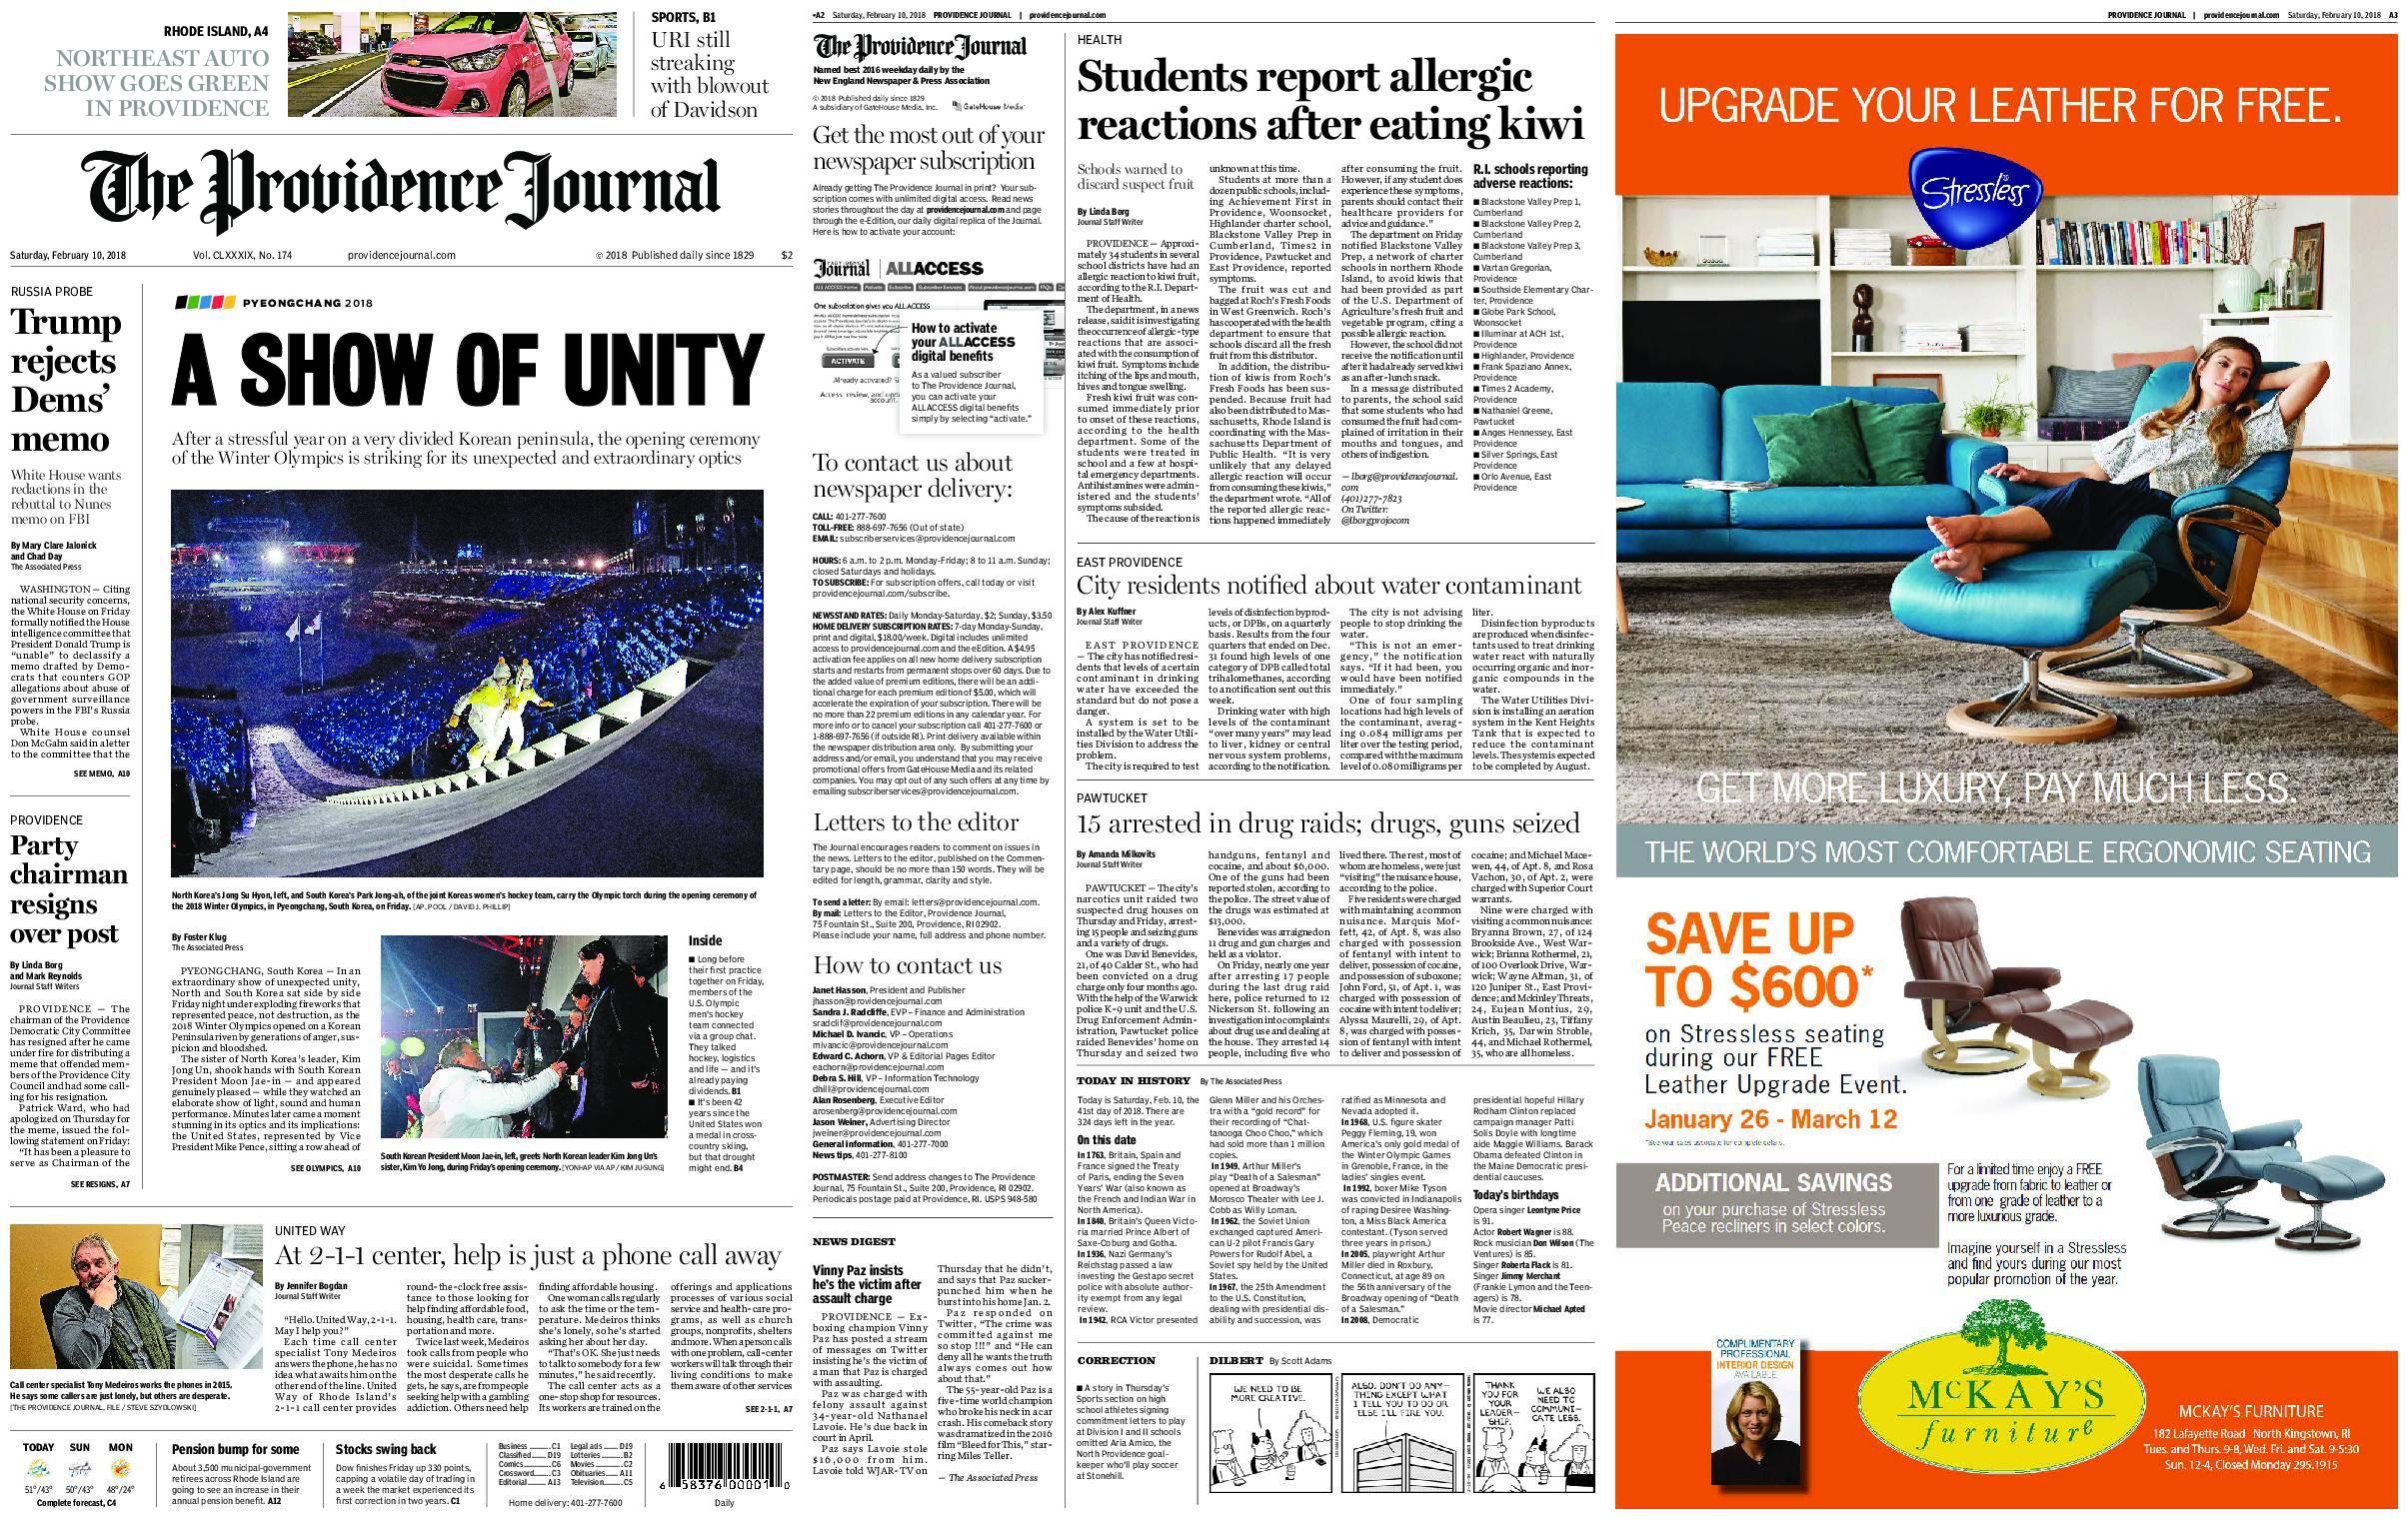 The Providence Journal – February 10, 2018 / AvaxHome